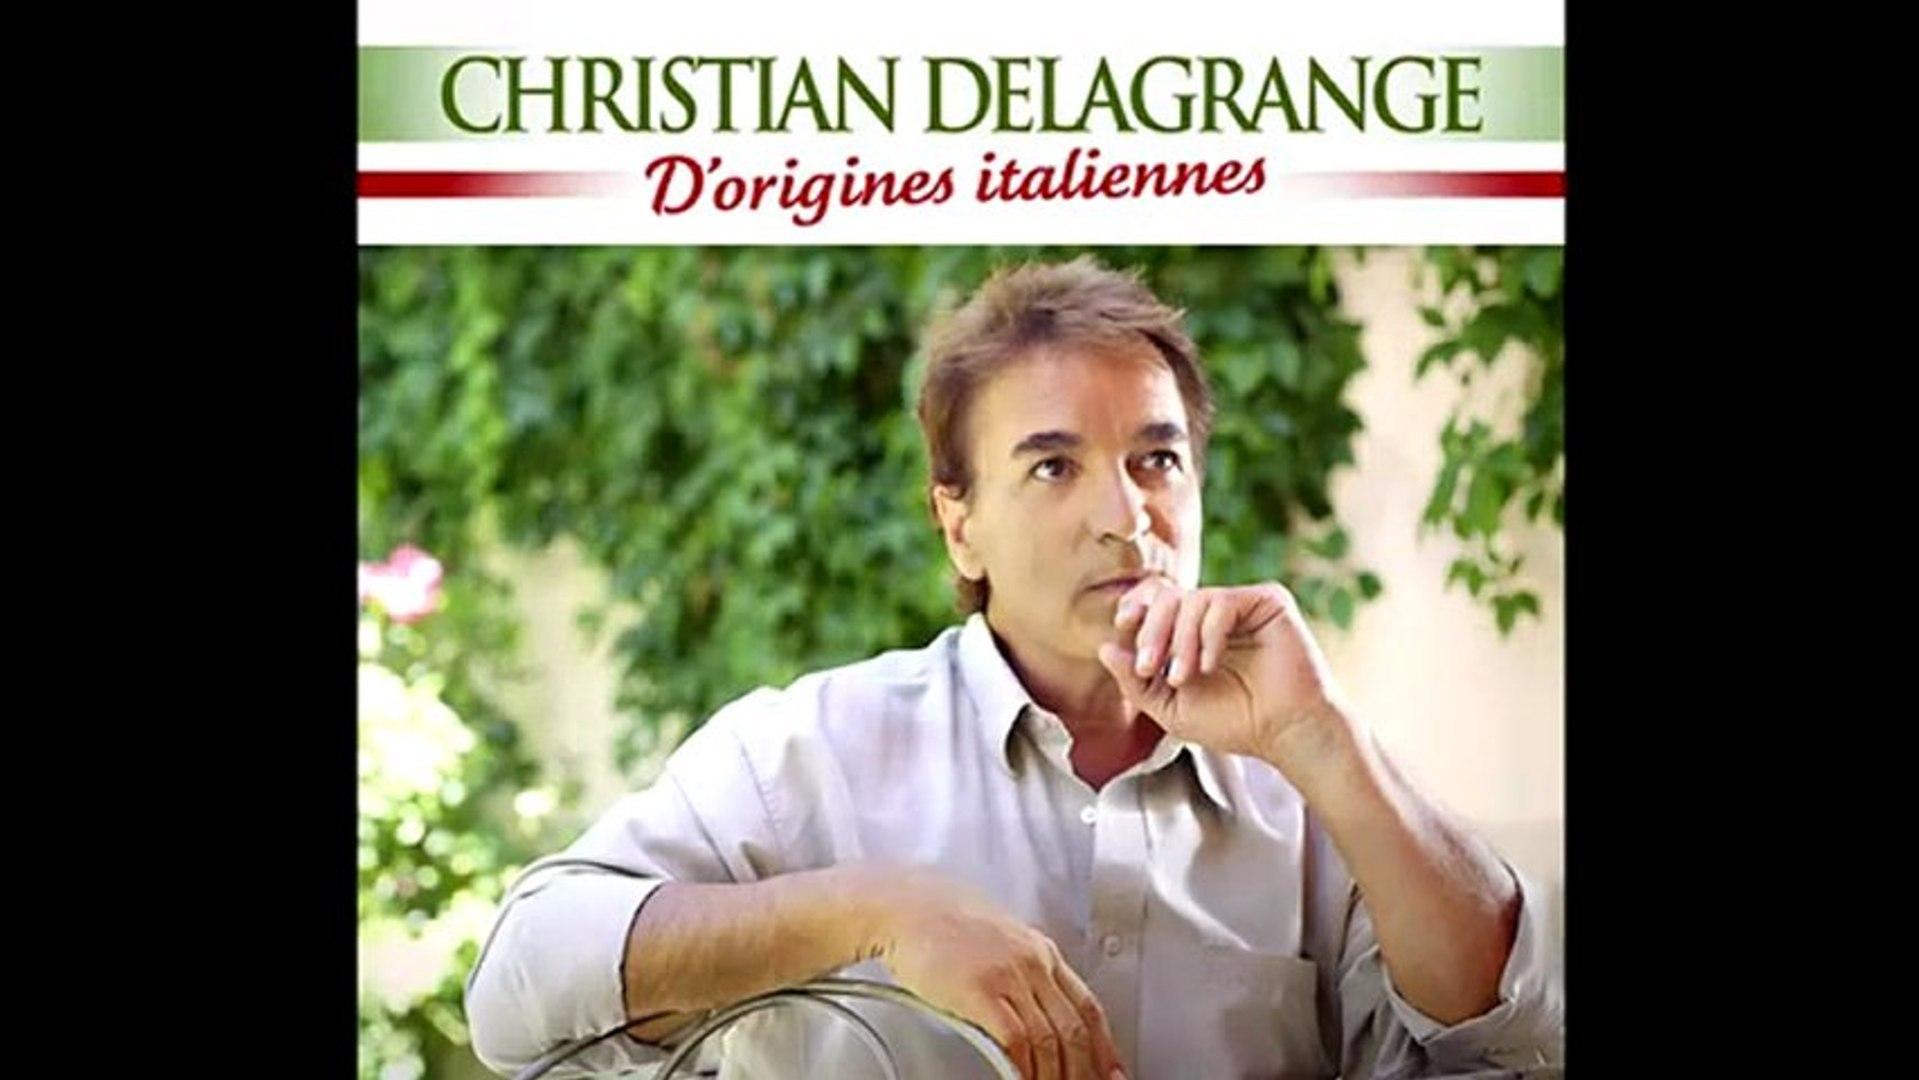 Christian delagrange cd succes